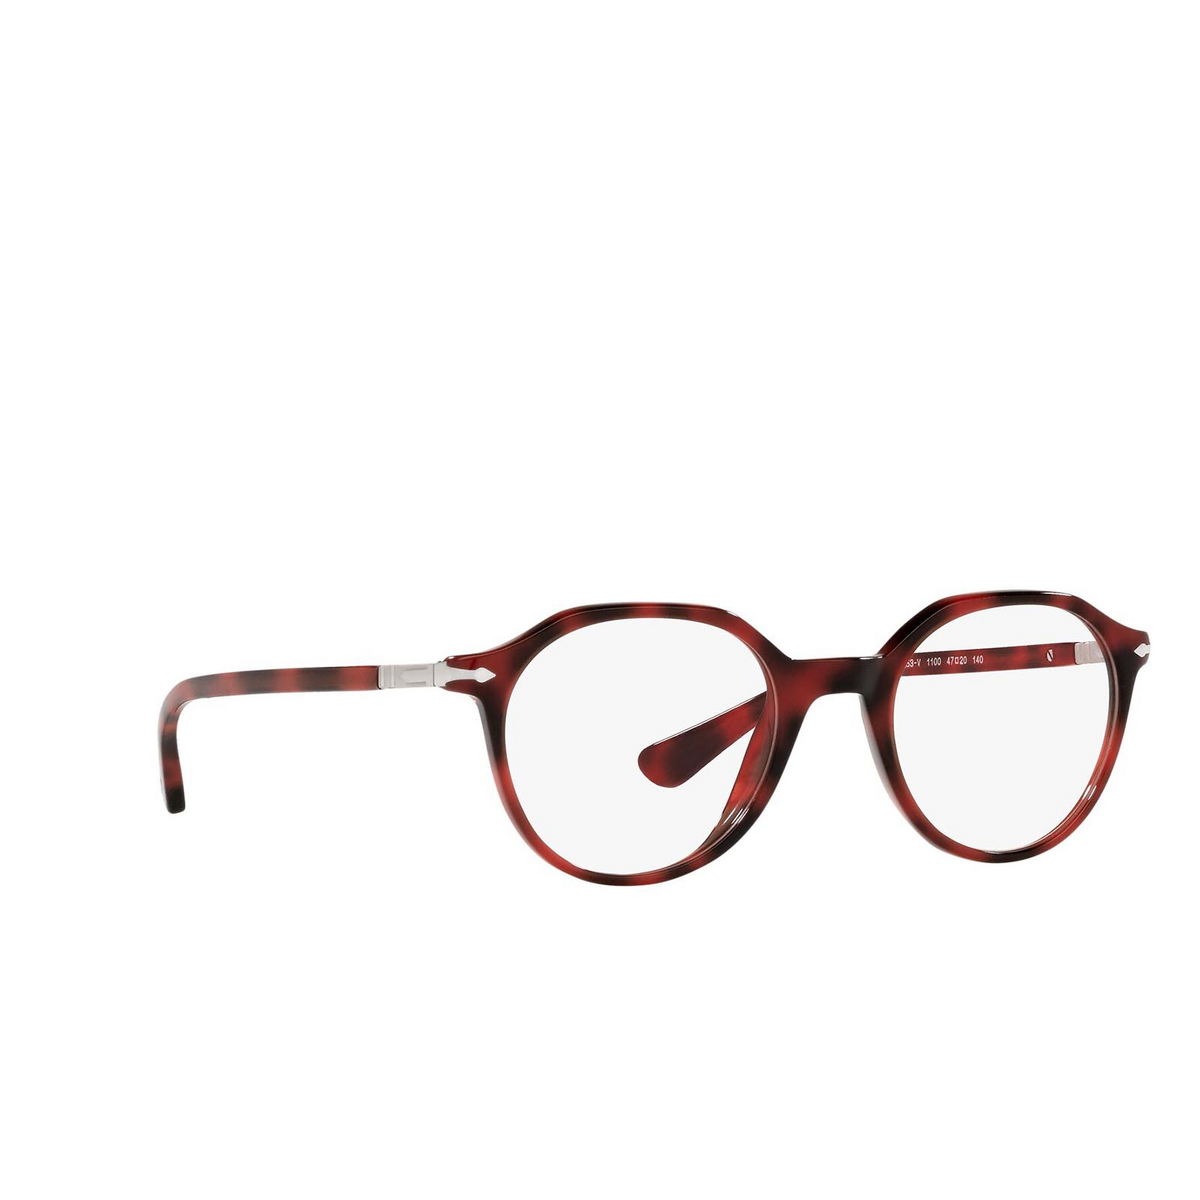 Persol® Irregular Eyeglasses: PO3253V color Red 1100 - three-quarters view.